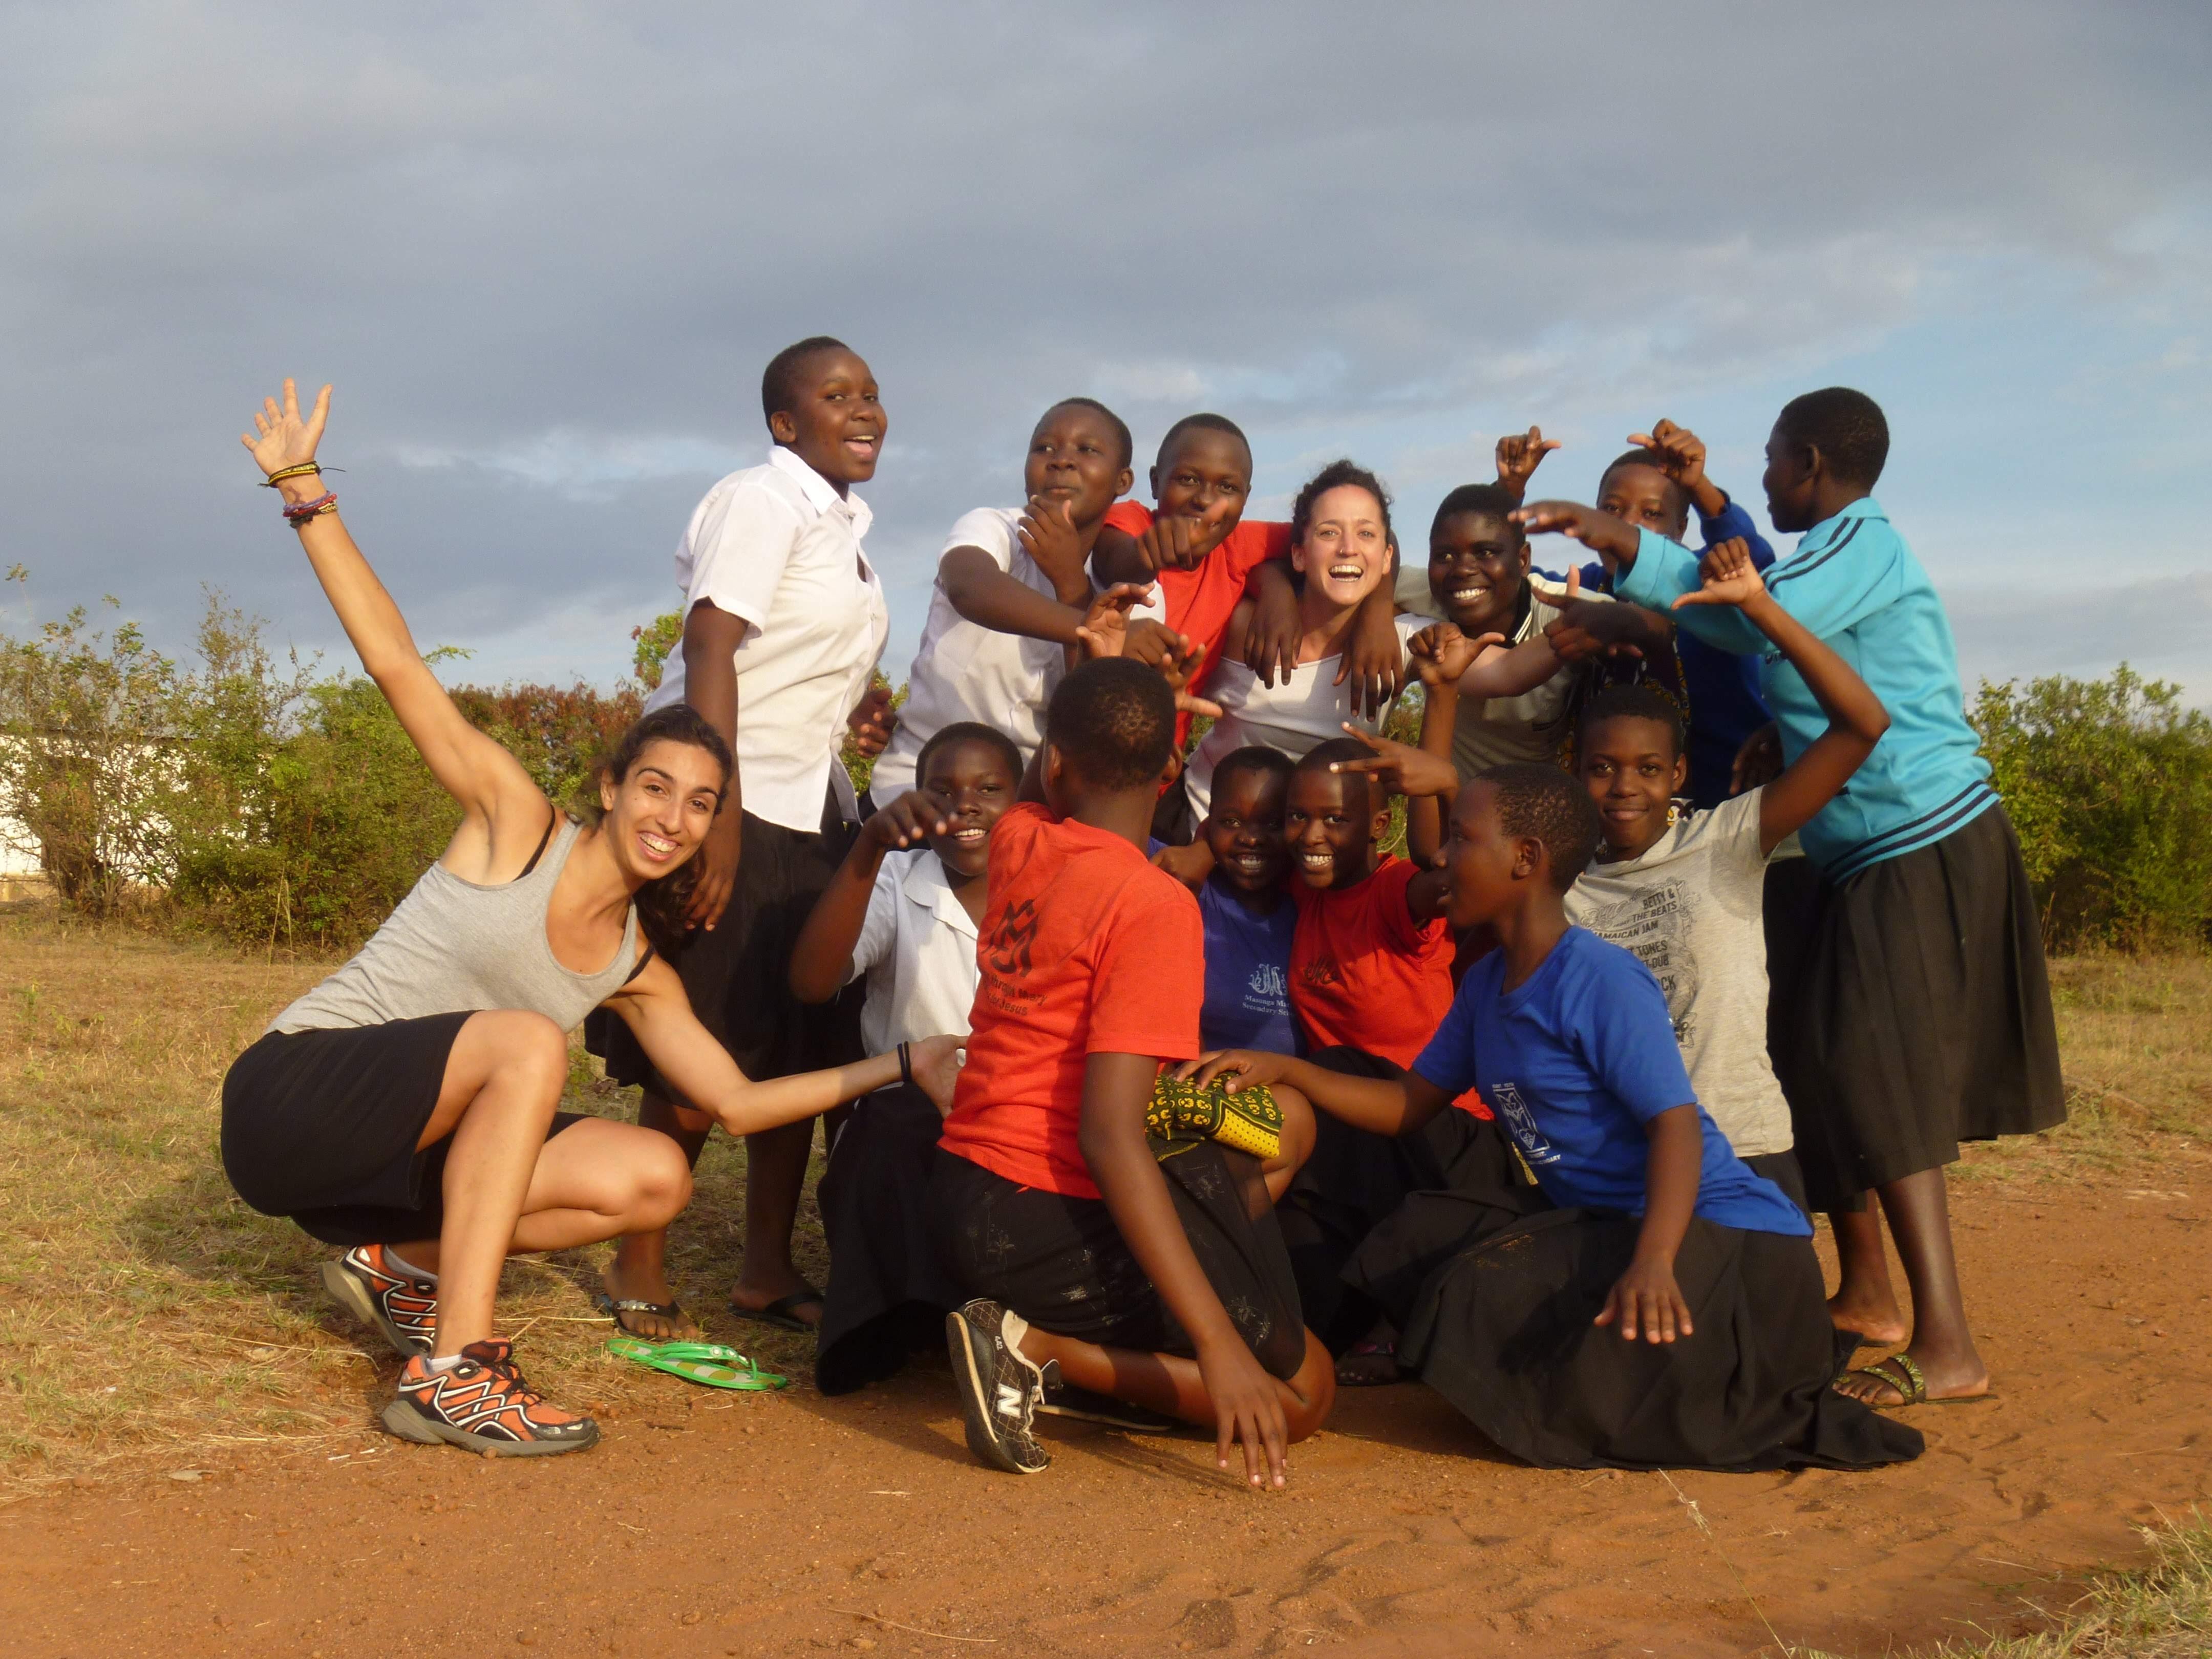 Un GIVING TUESDAY por la educación en Tanzania